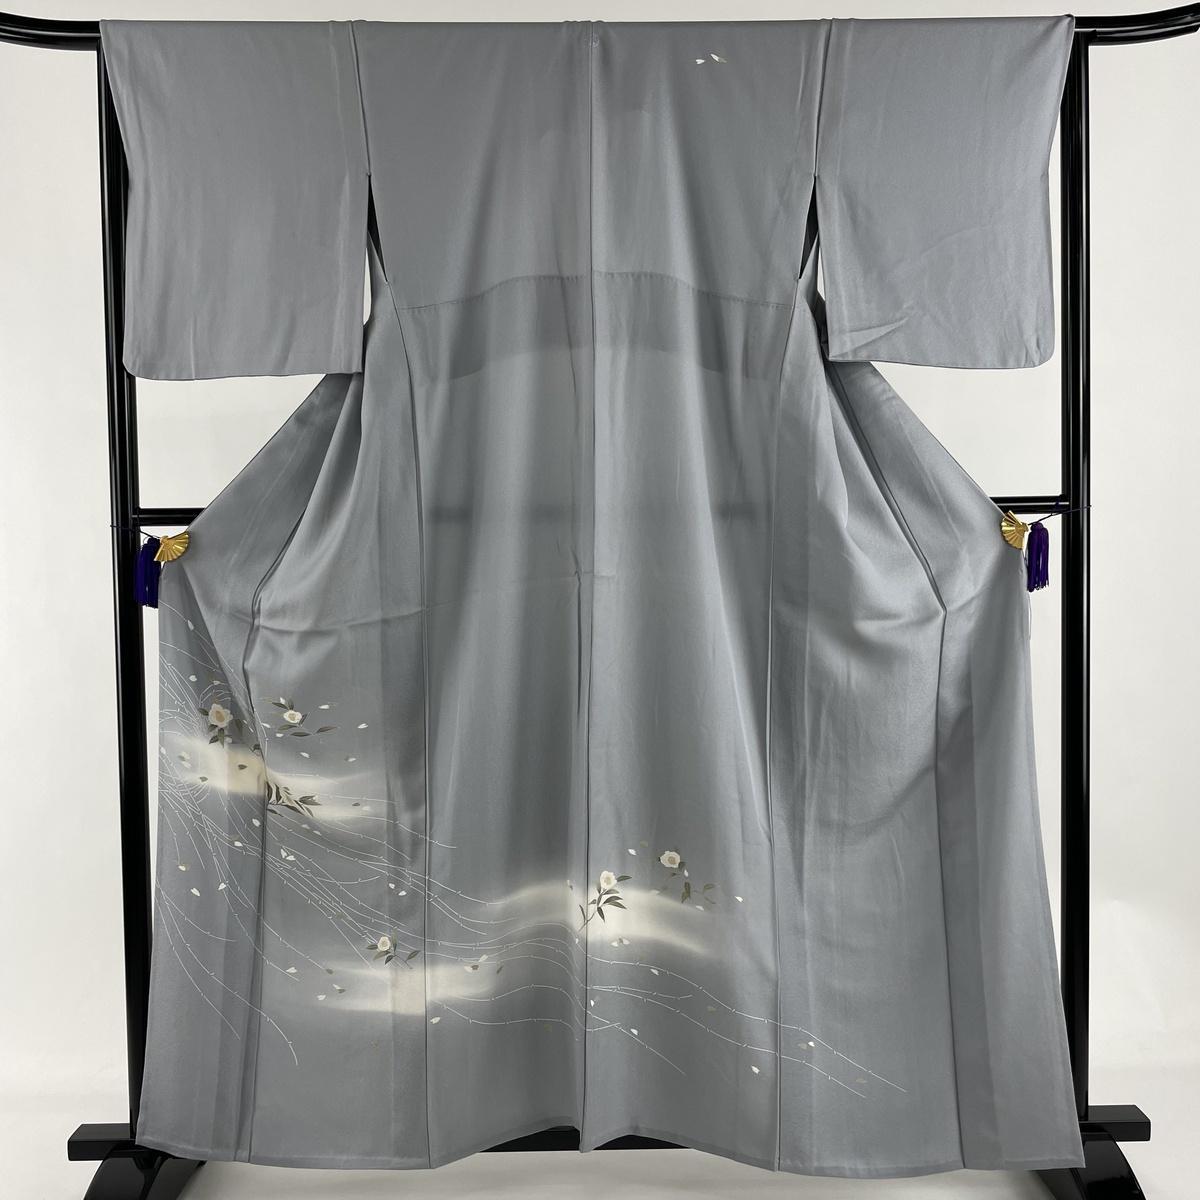 ランクA 着物 リサイクル 送料無料 訪問着 美品 秀品 一つ紋 枝花 青灰色 無料 霞 身丈160cm 単衣 中古 正絹 裄丈65cm M 正規取扱店